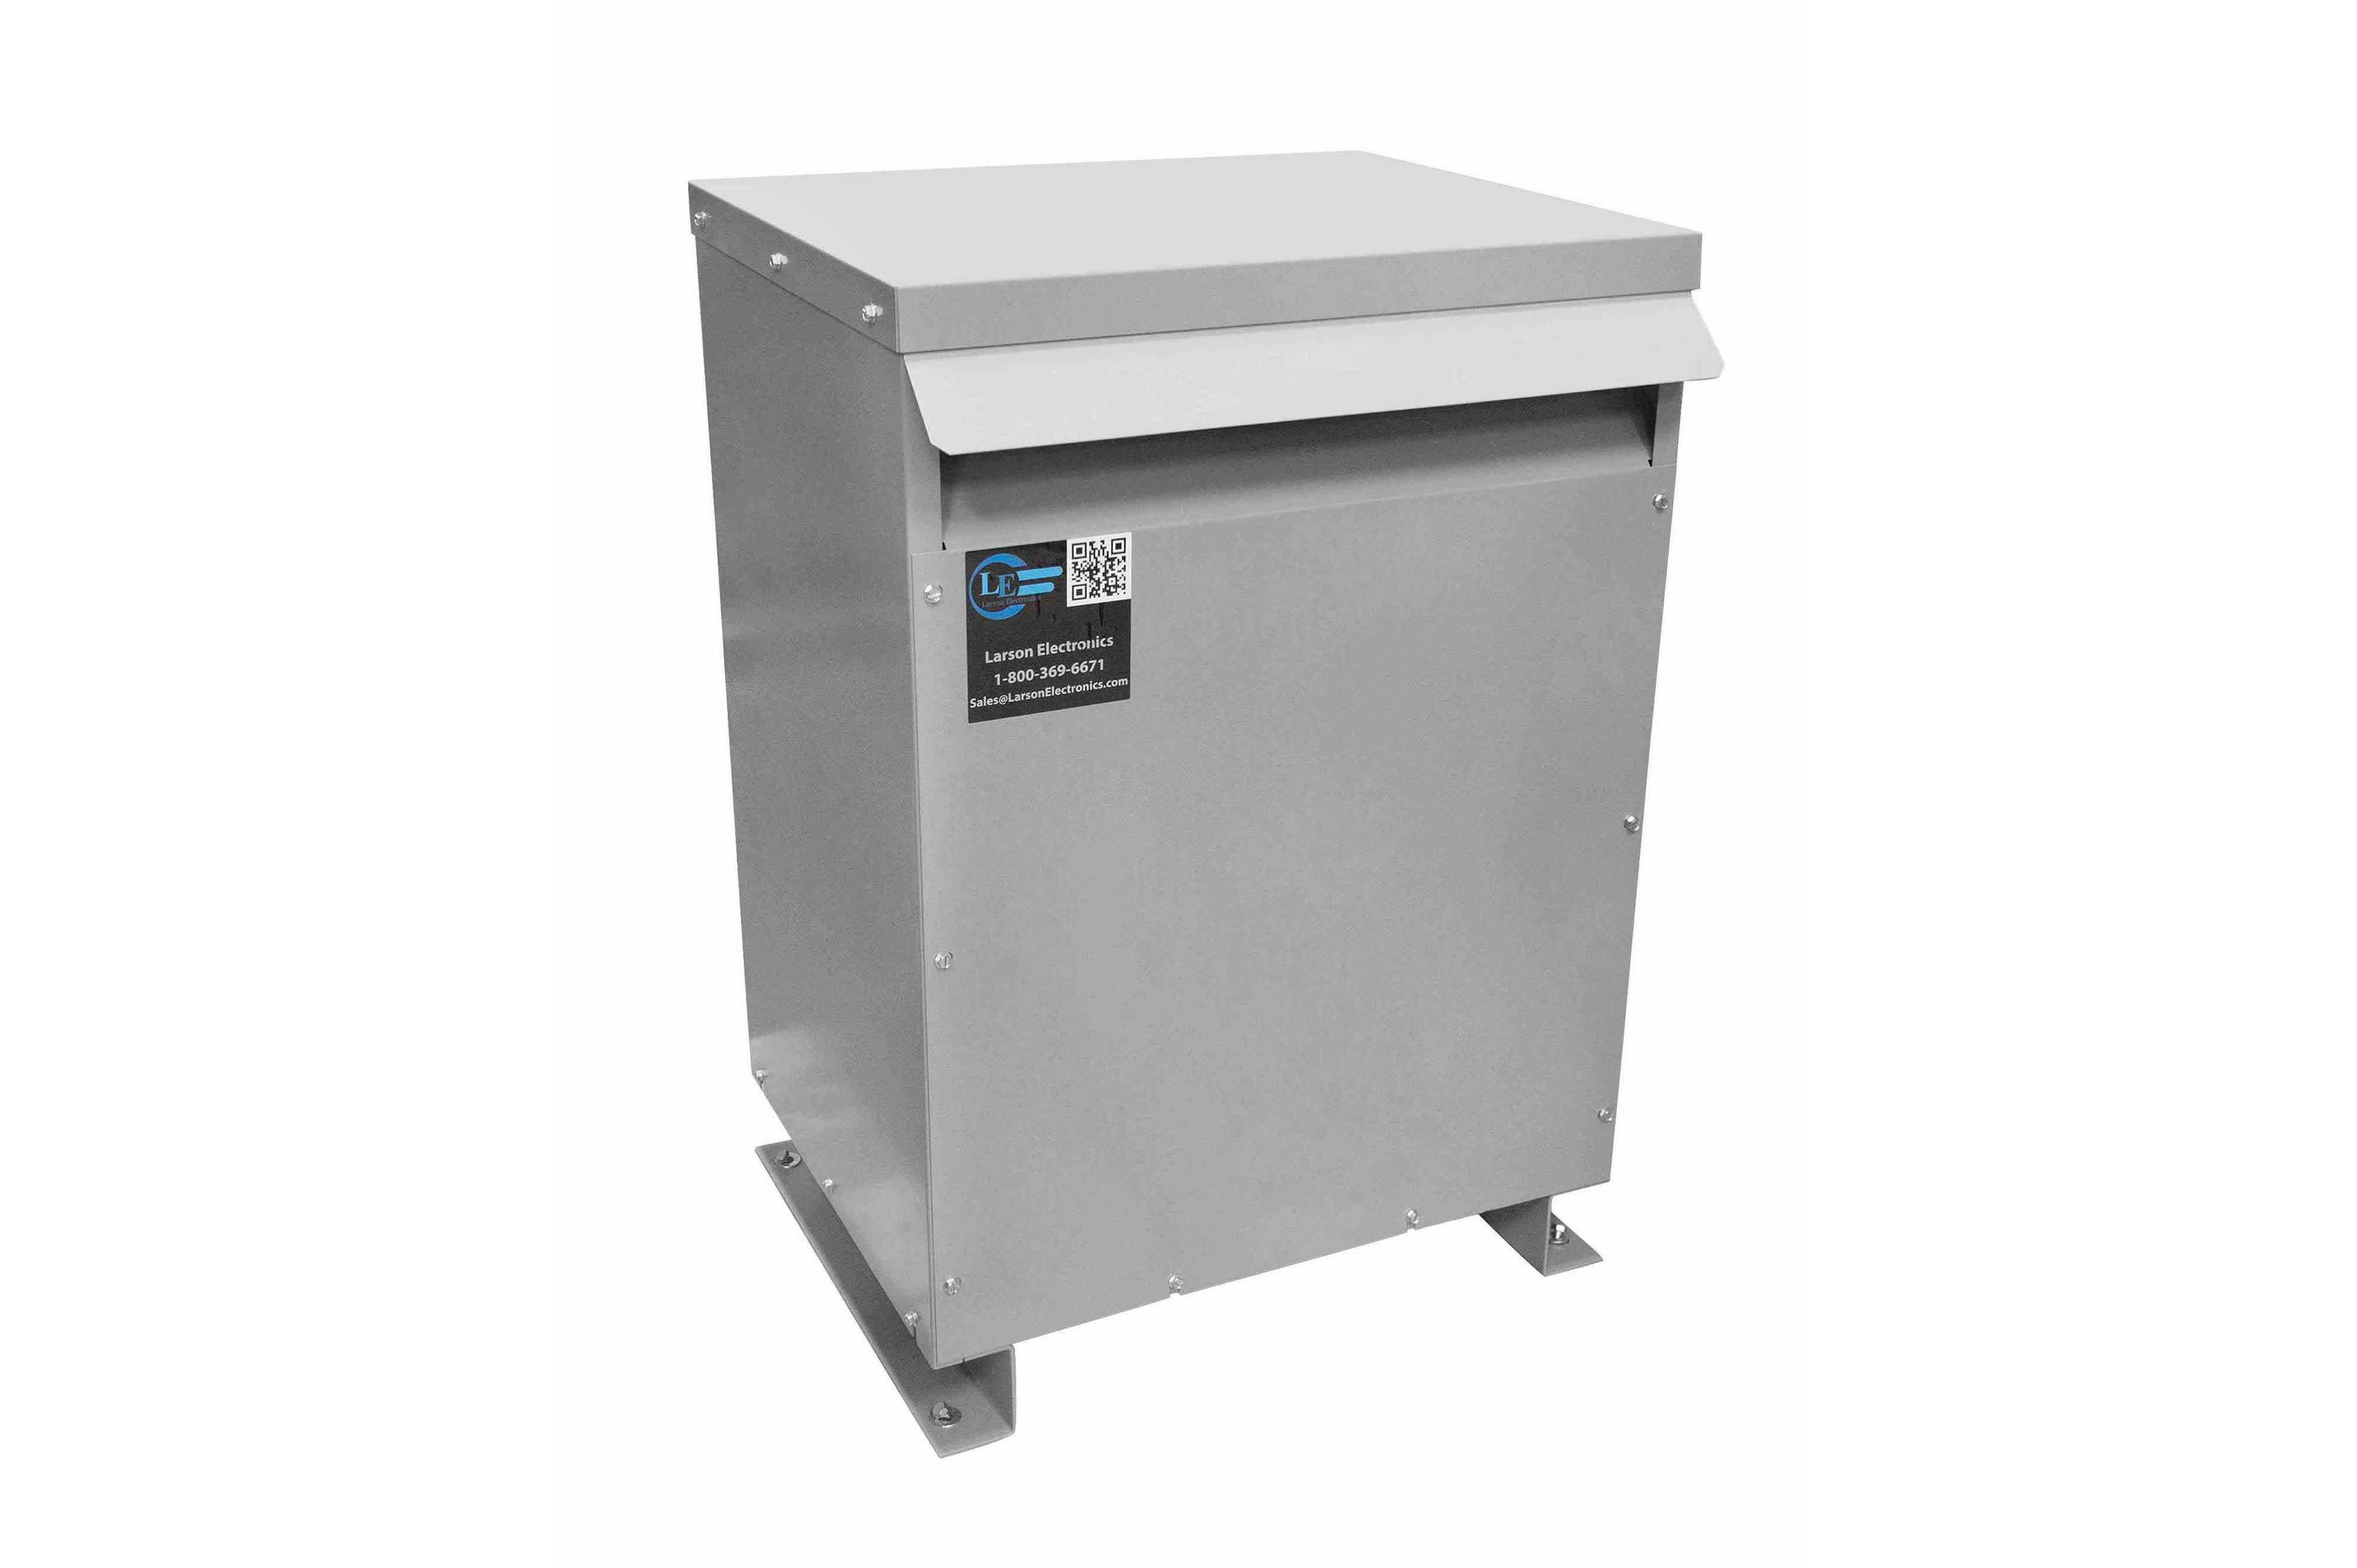 12 kVA 3PH DOE Transformer, 400V Delta Primary, 208Y/120 Wye-N Secondary, N3R, Ventilated, 60 Hz